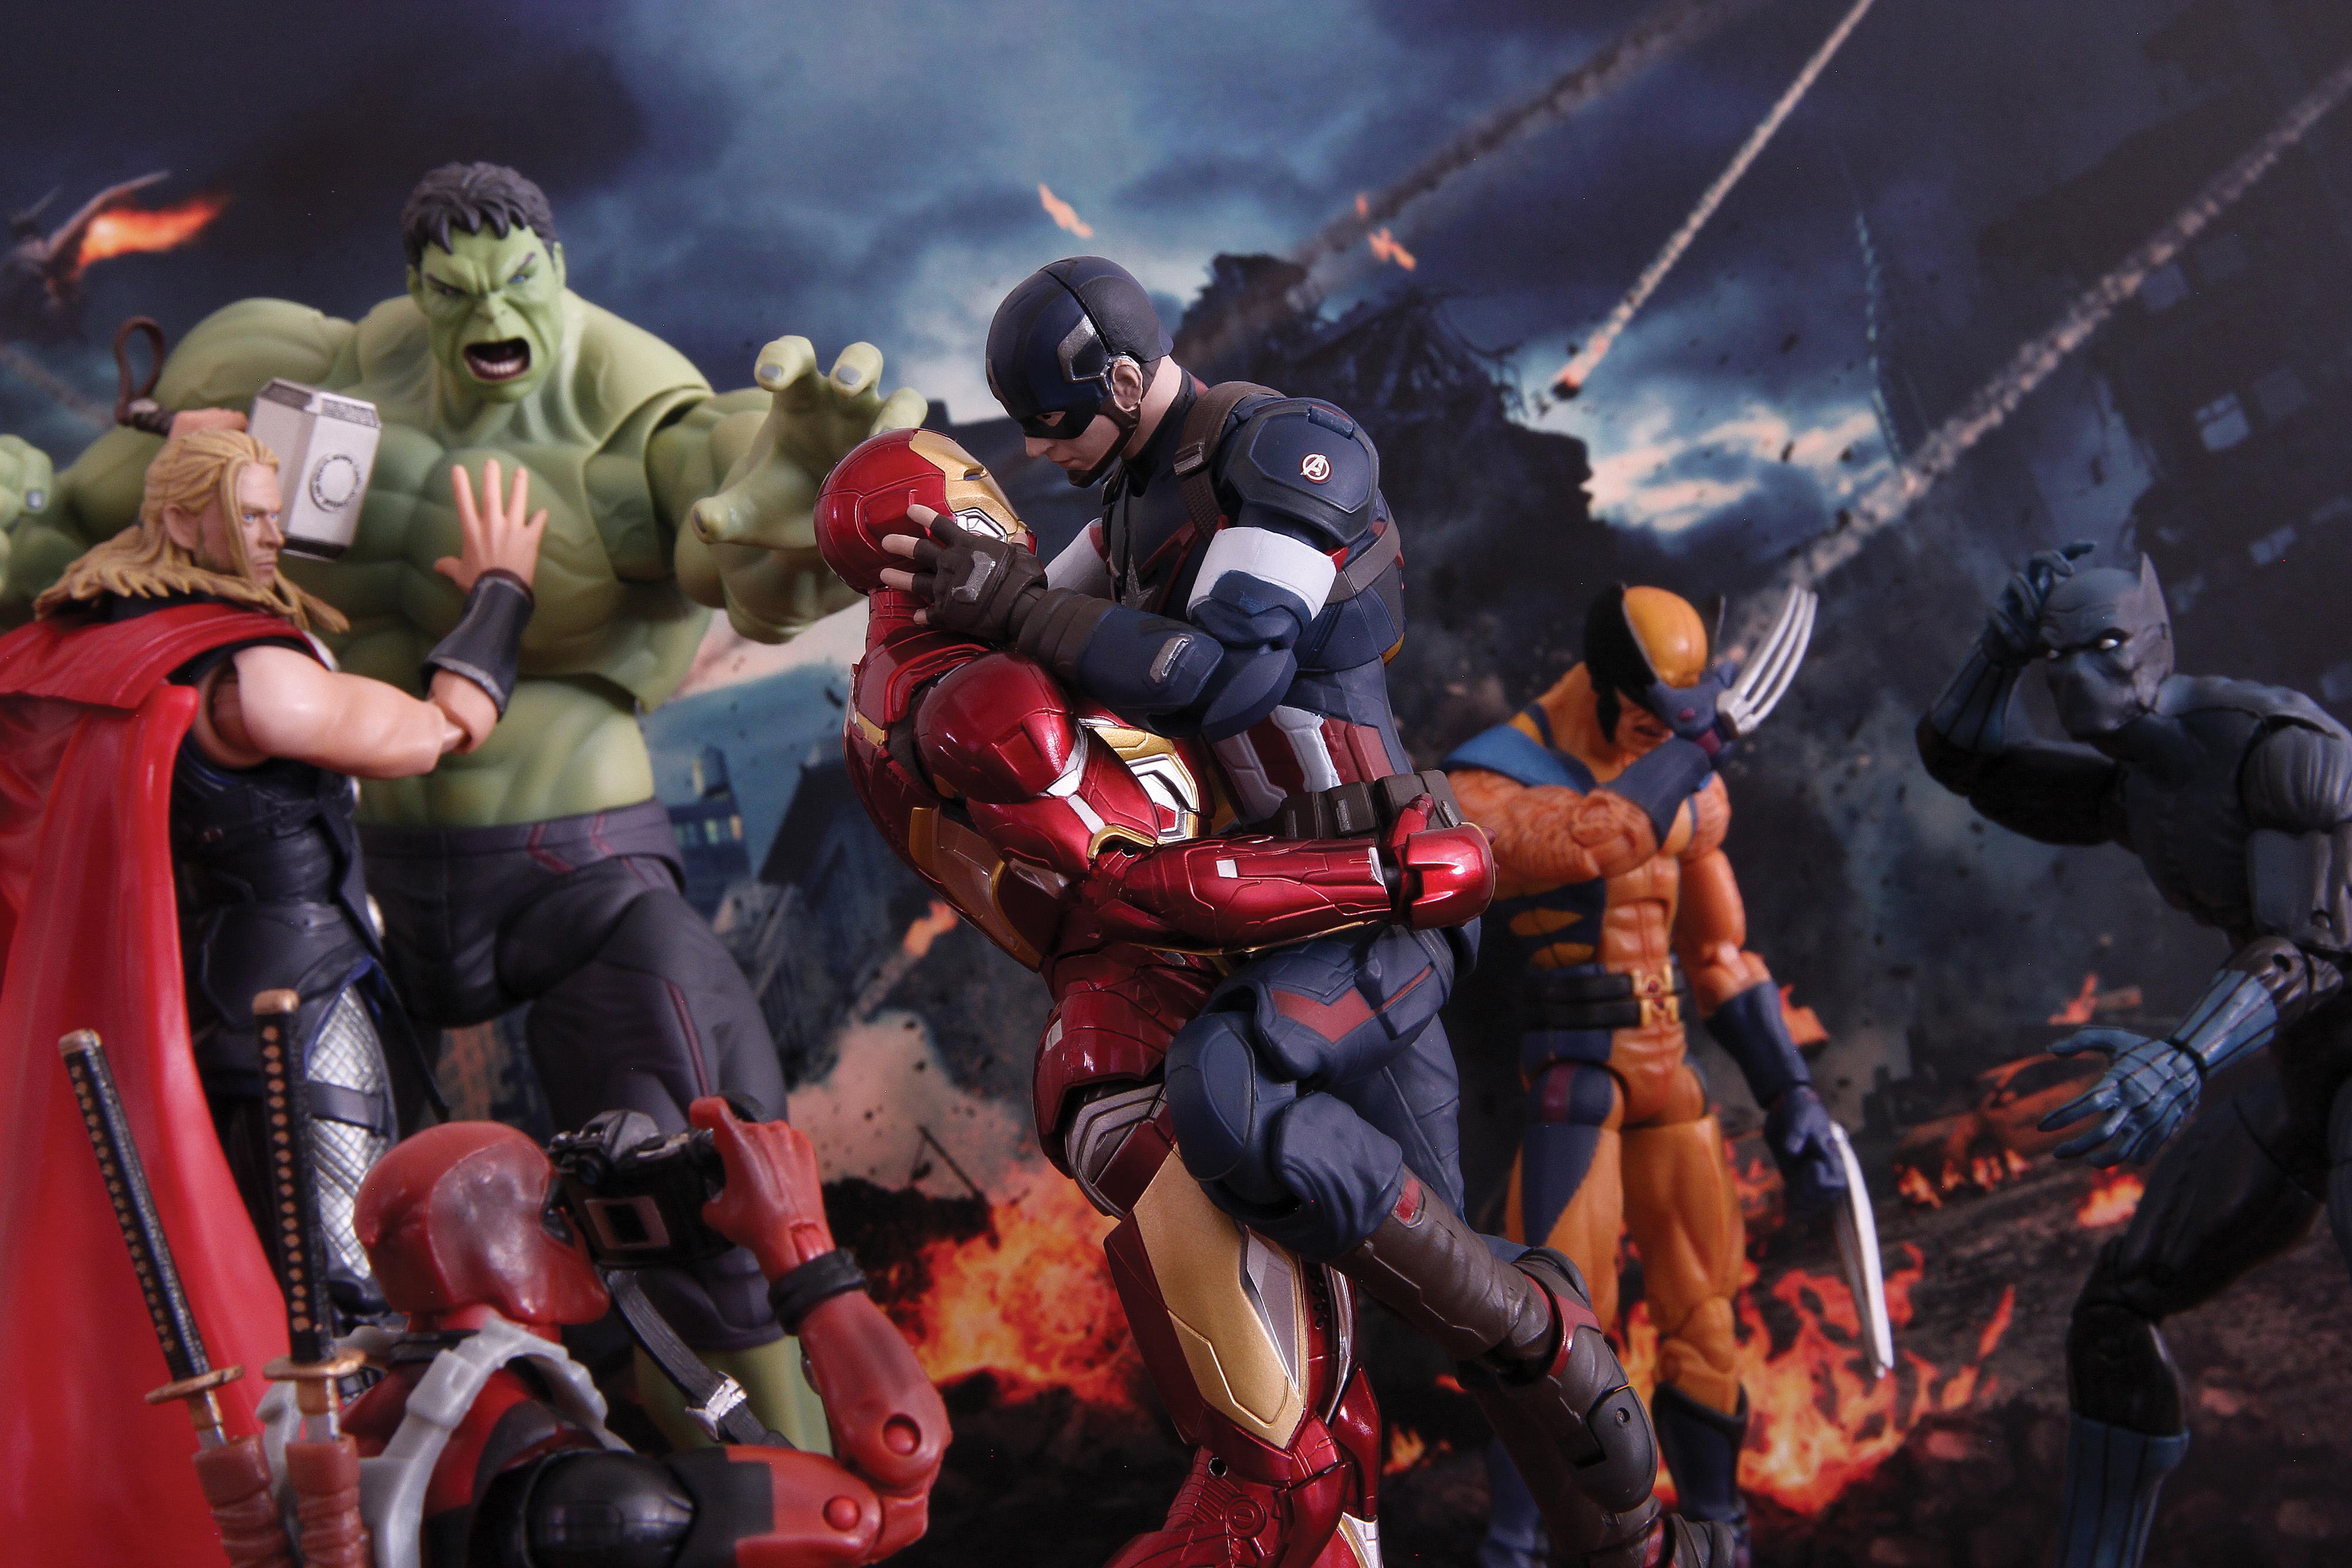 marvel bandai thor s.h.figuarts captain_america hulk avengers:_age_of_ultron iron_man_mark_xlv